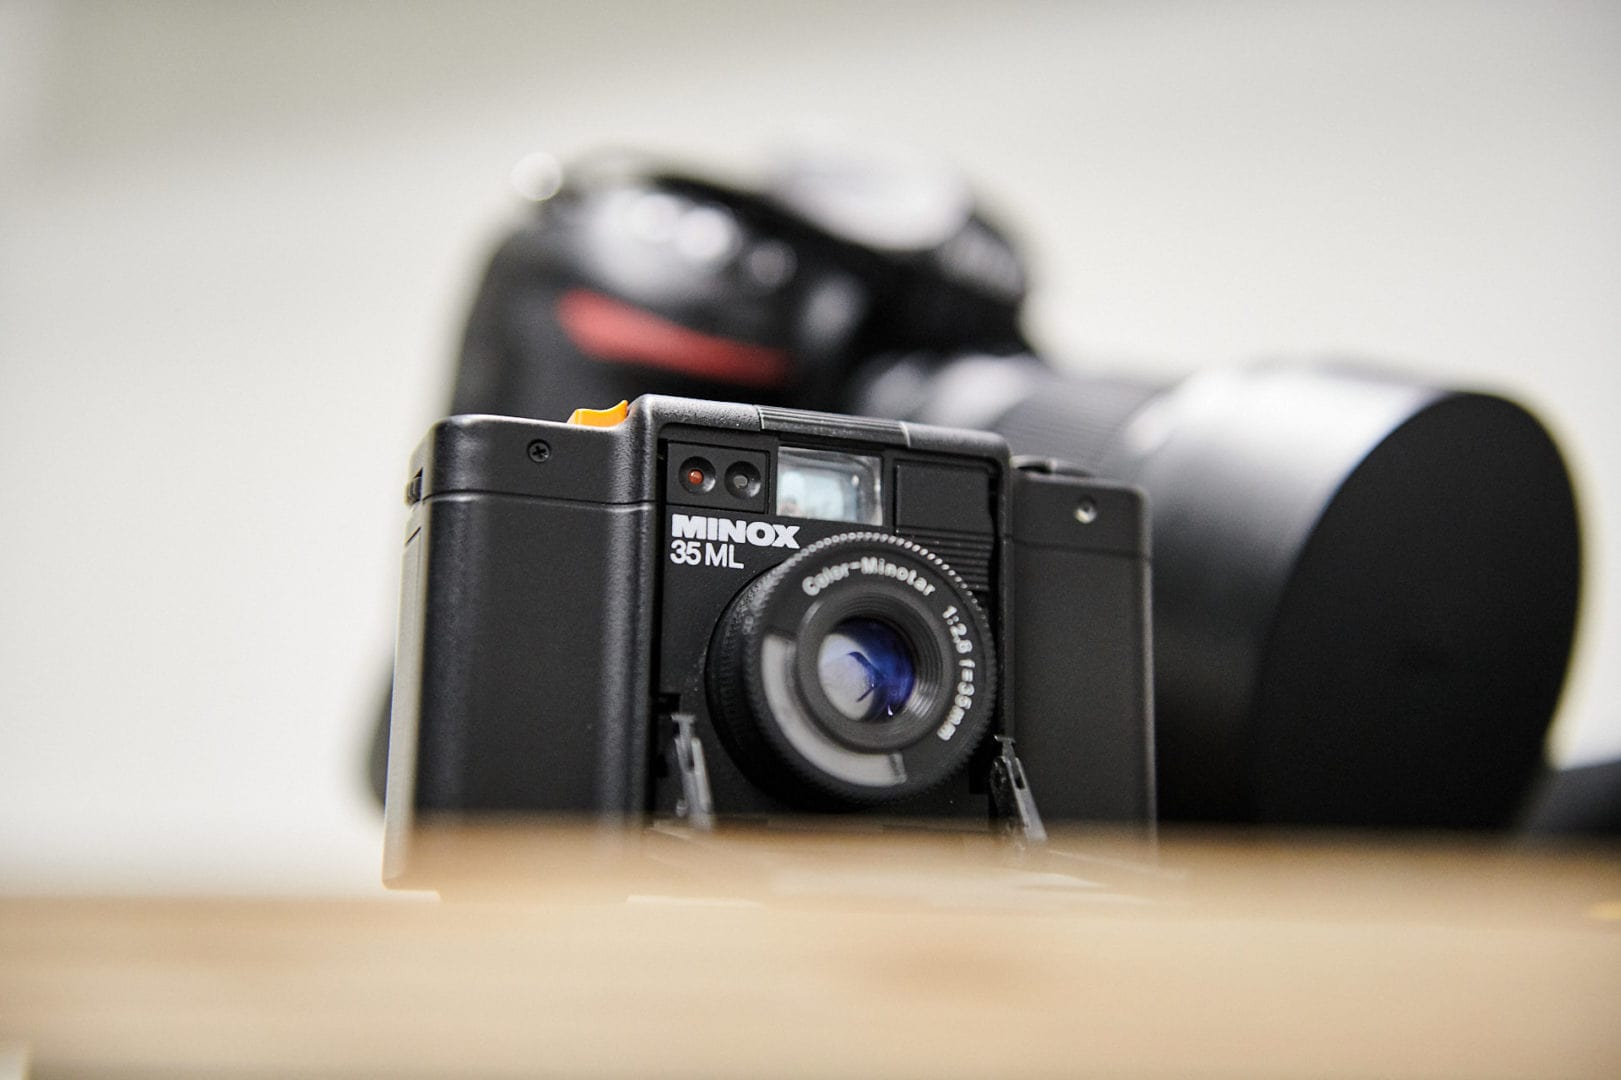 Minox und Nikon Kameras im Fotostudio Mielek in Dortmund